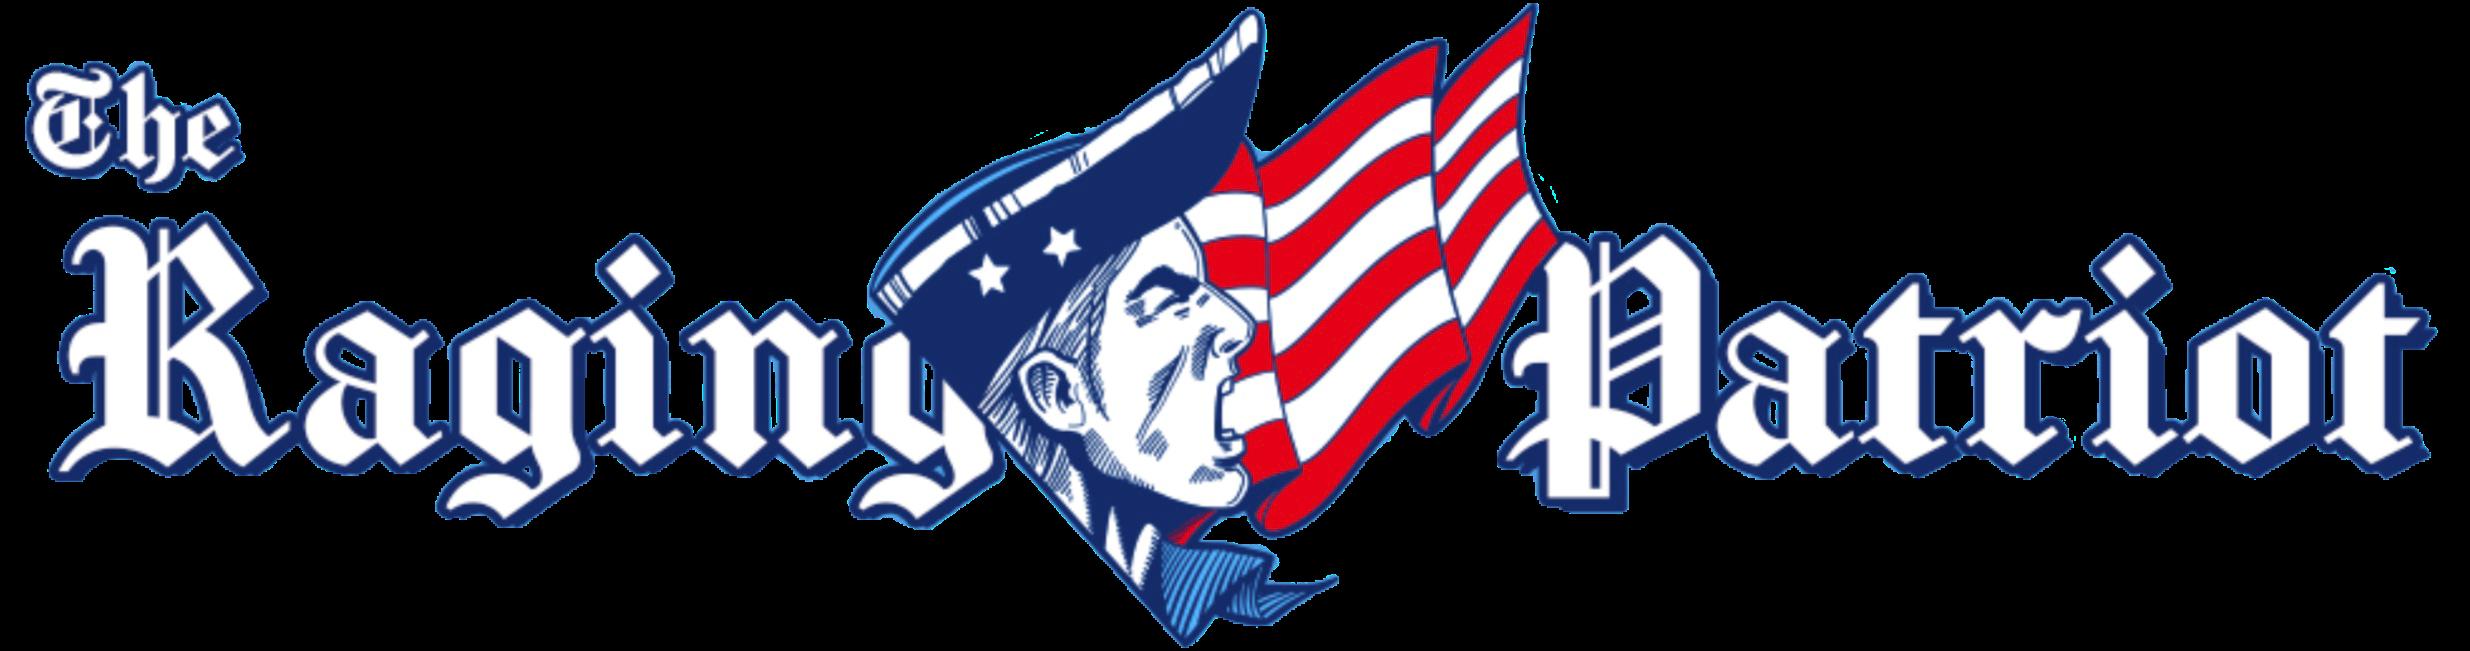 The Raging Patriot